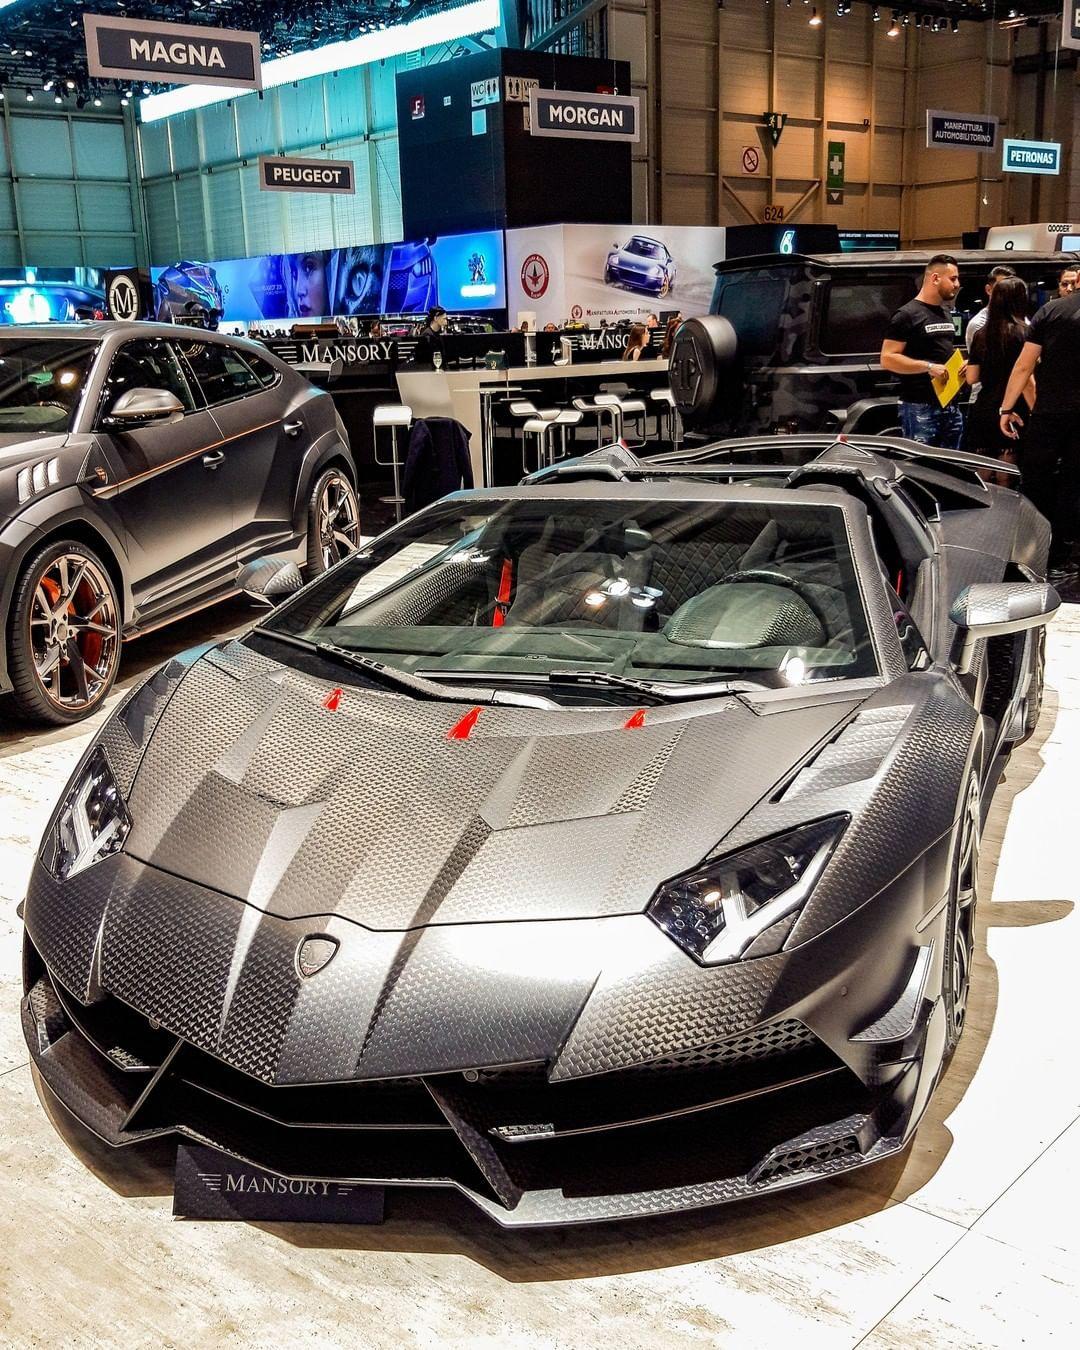 Mansory Carbonado Apertos In 2020 Super Luxury Cars Super Cars Sports Cars